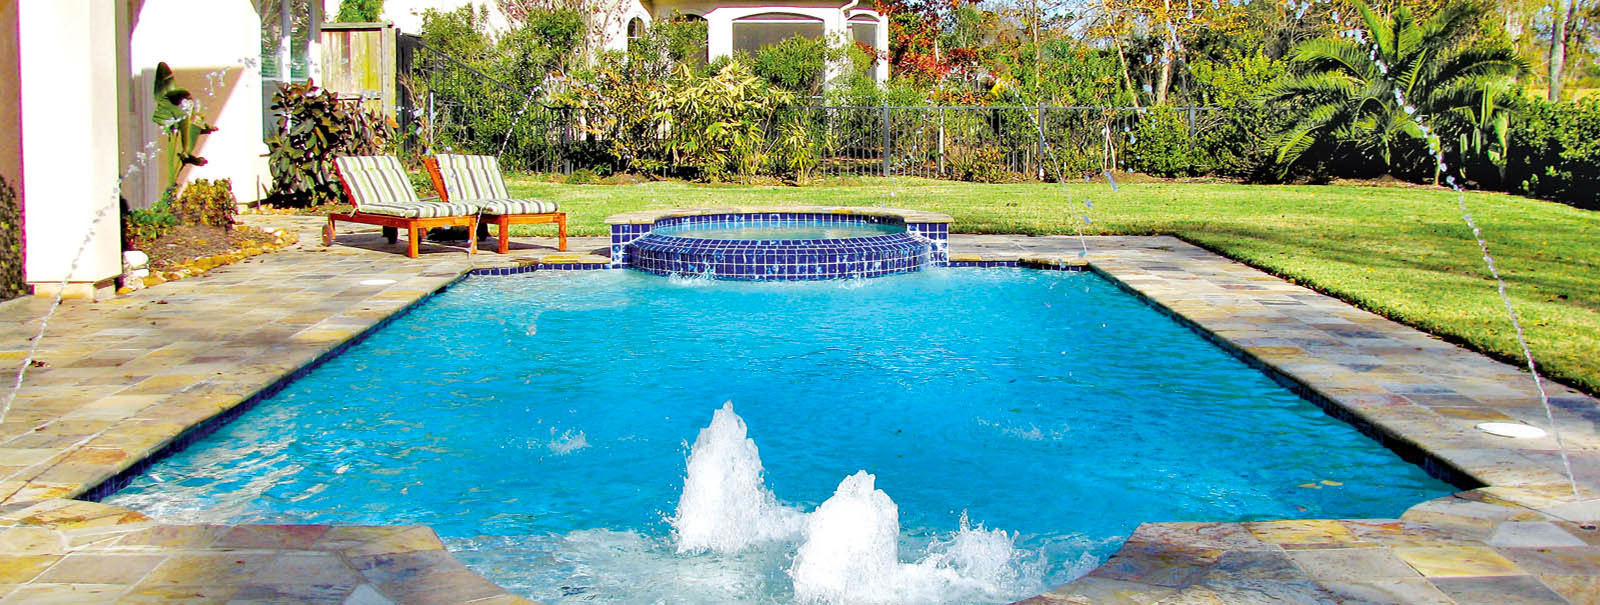 Houston-swimming-pools